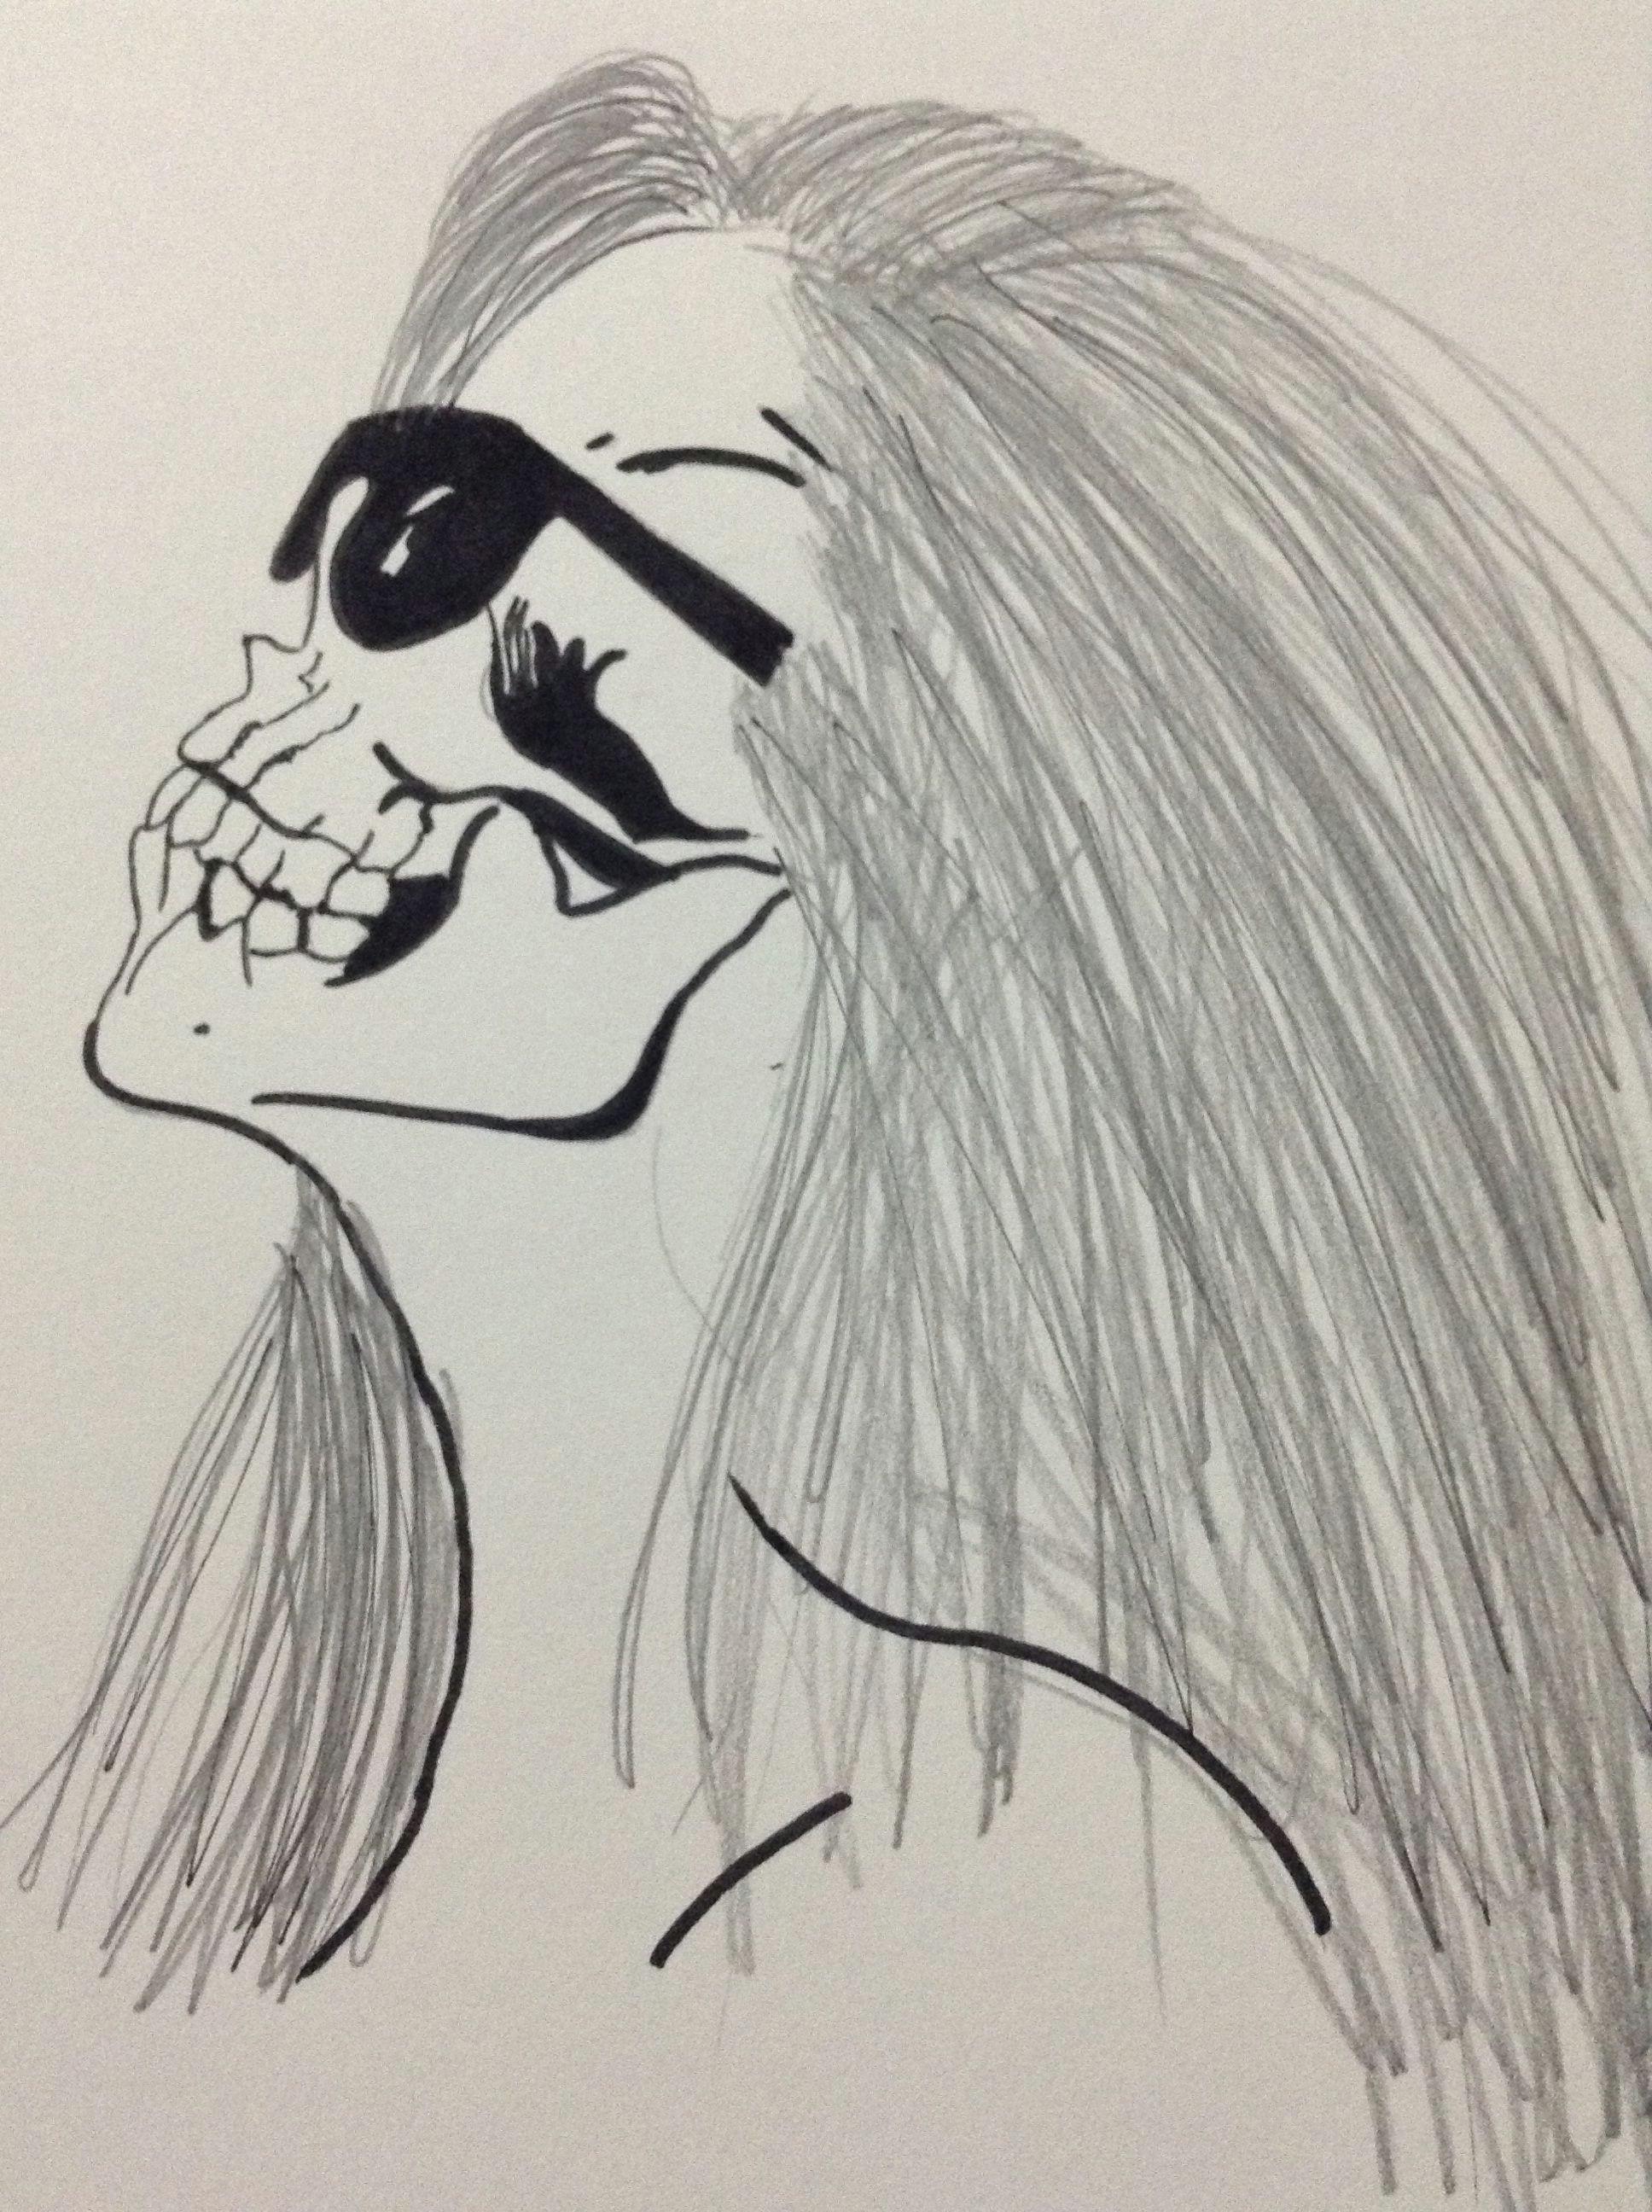 my skull girl drawing girl drawings skull girl paintings sugar skull girl